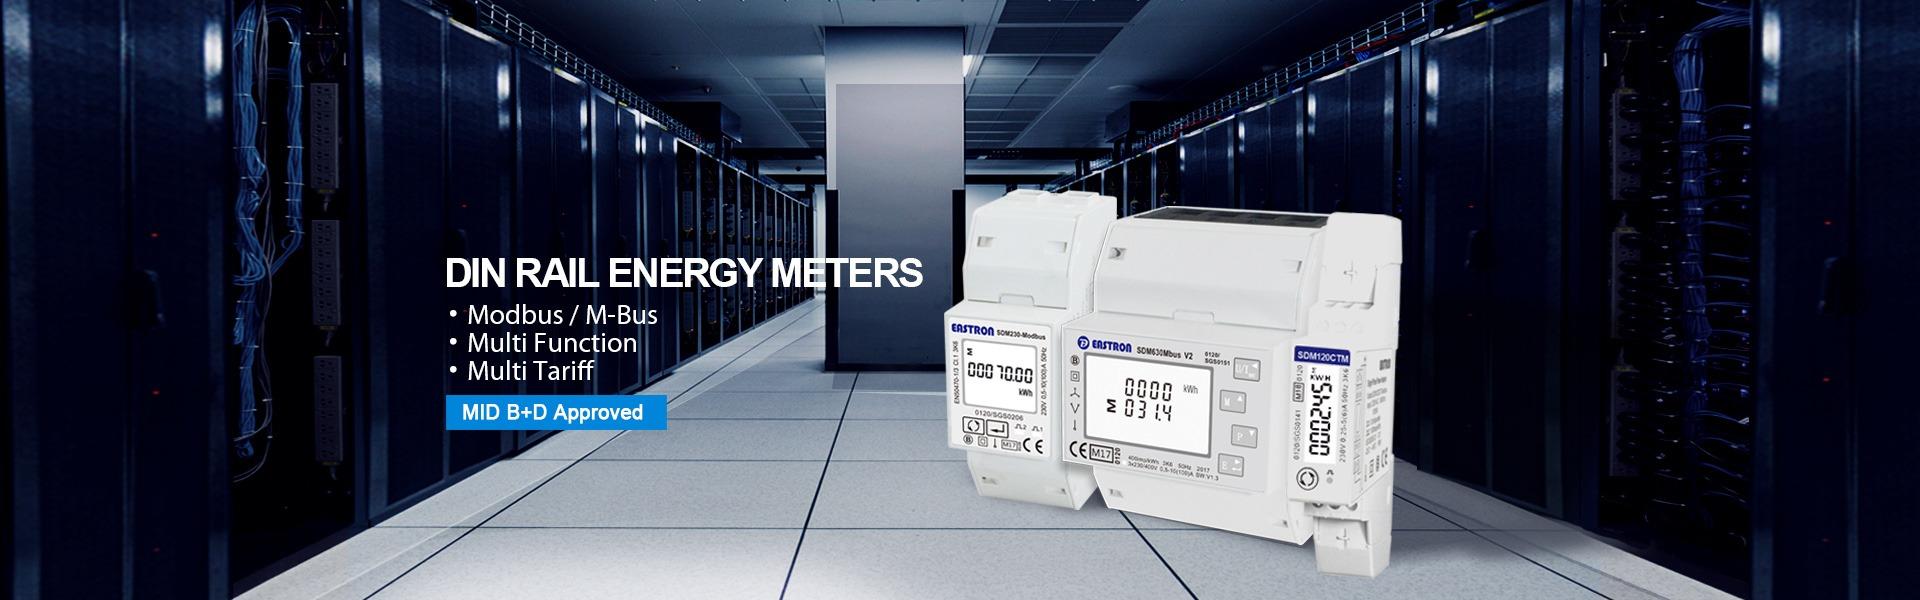 Zhejiang Eastron Electronic Co , Ltd  - Energy Meter, power